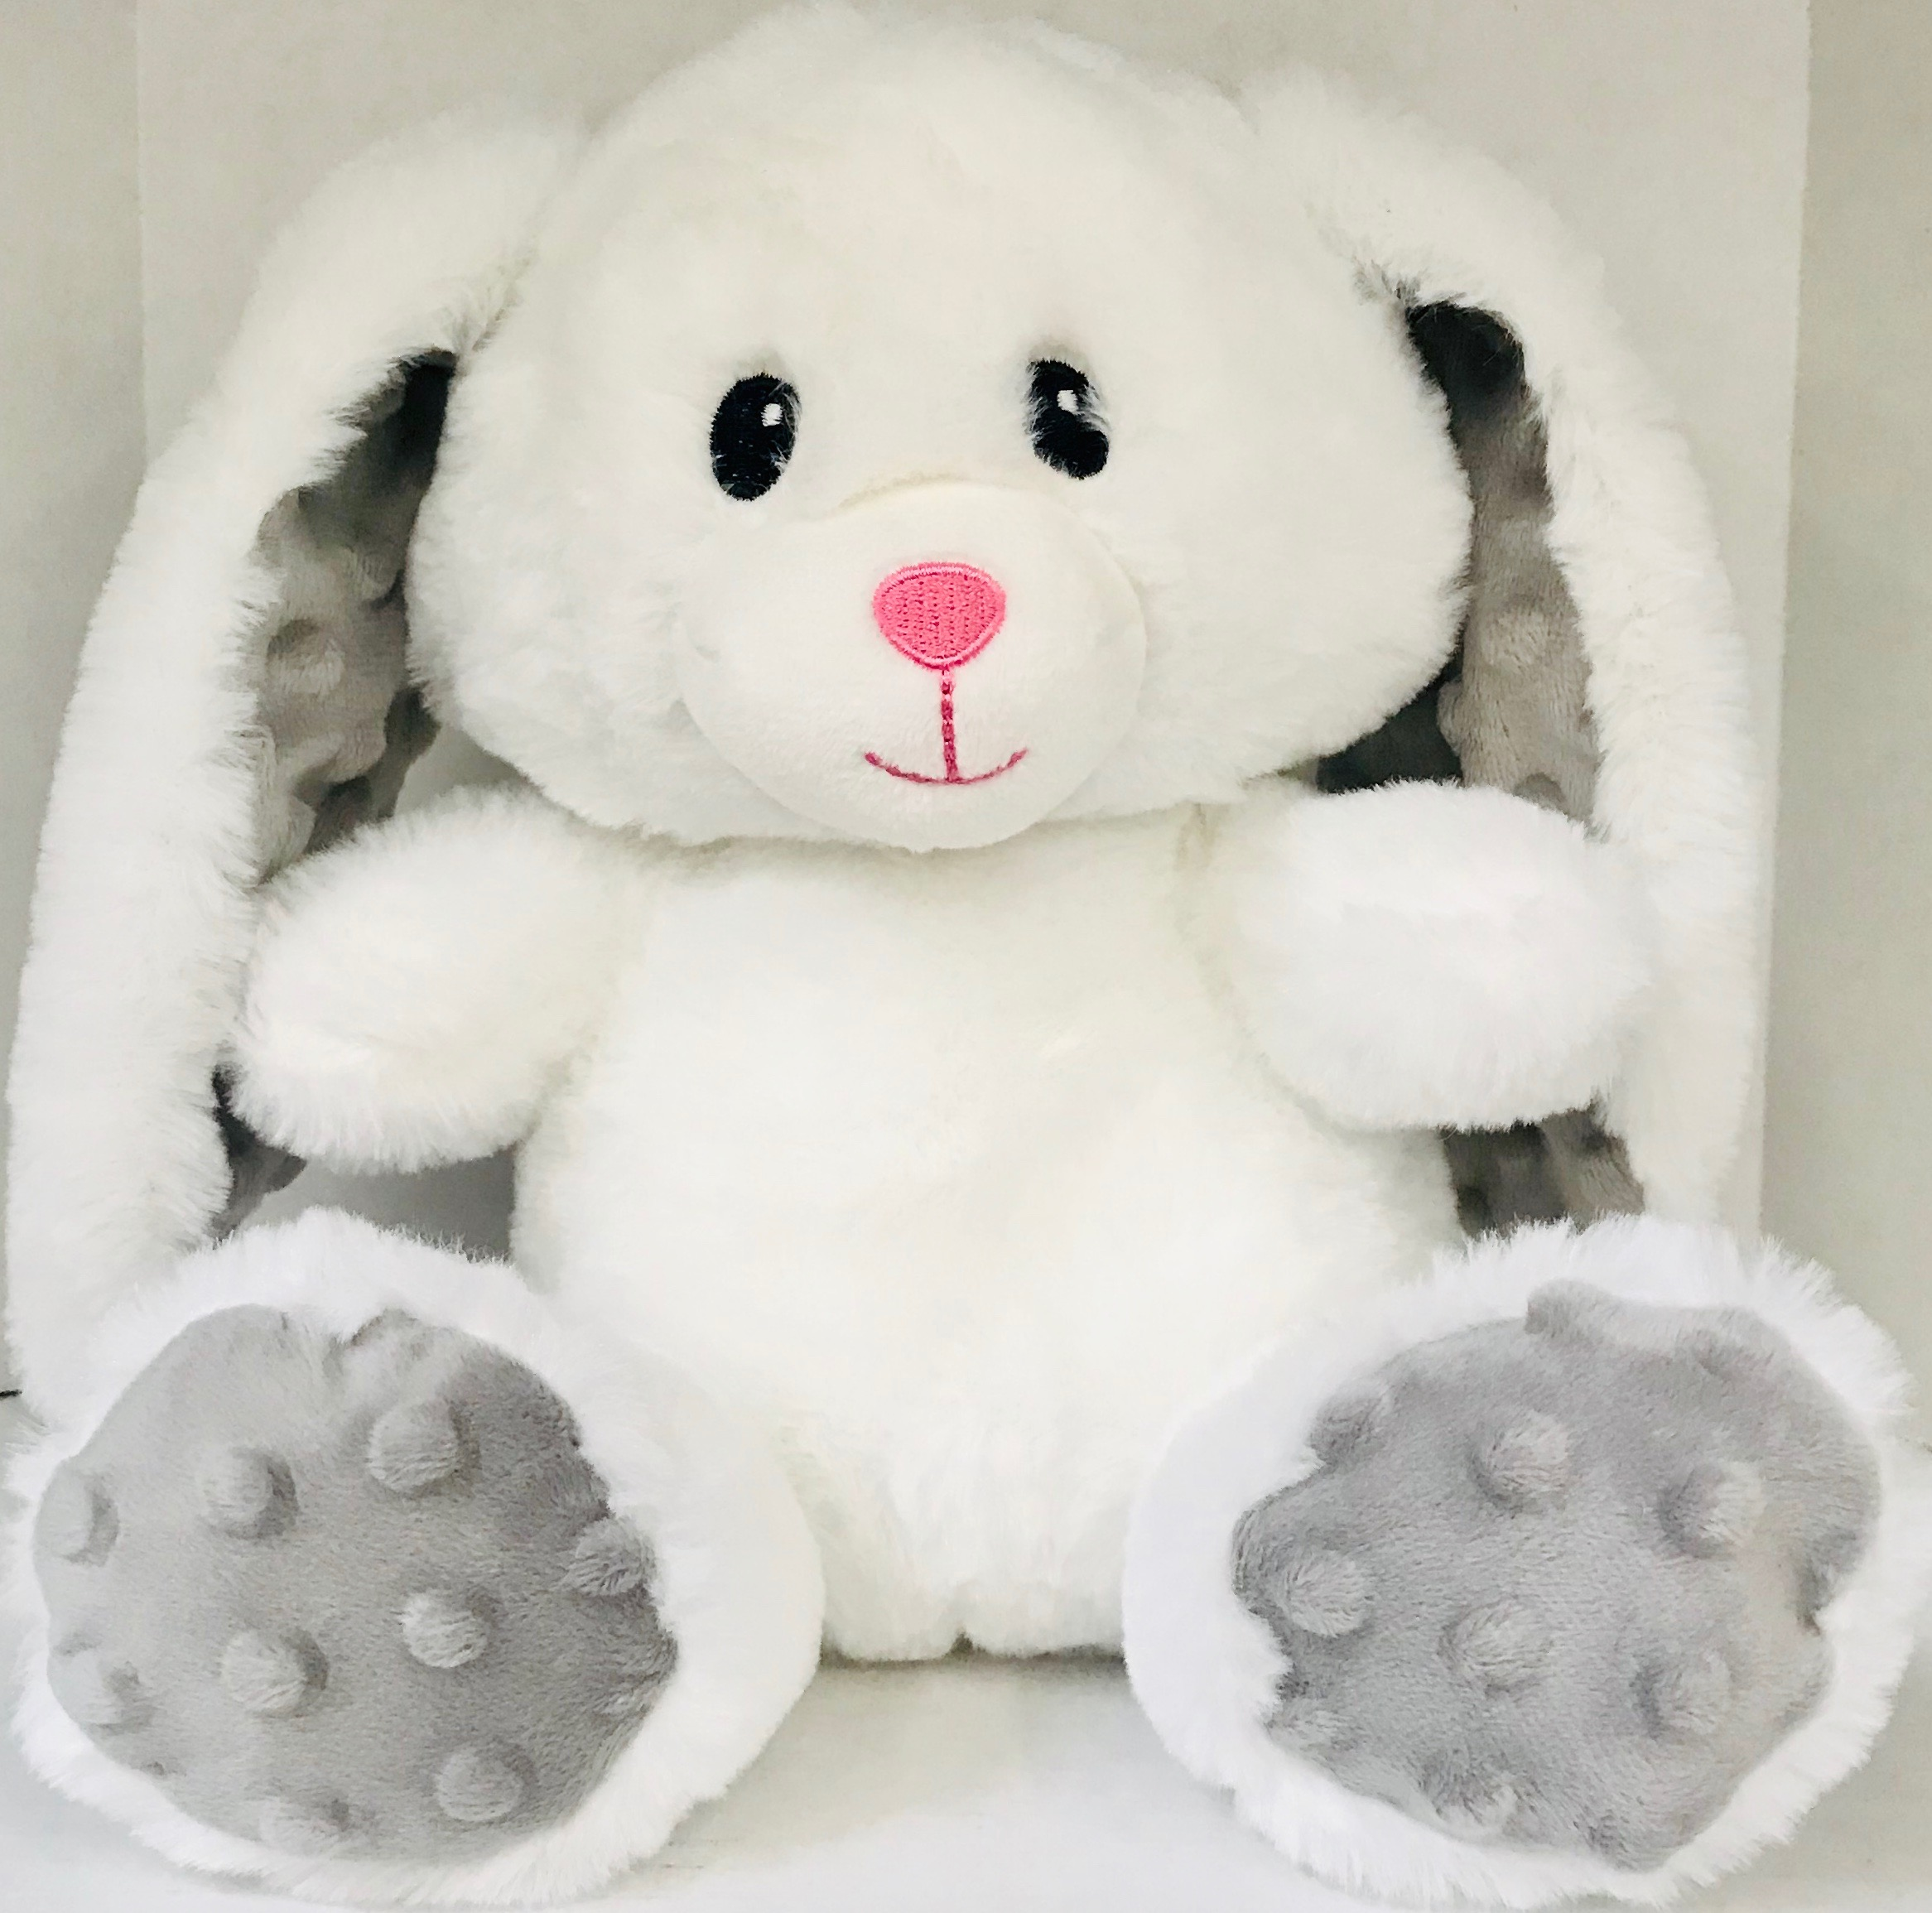 Spark Create Imagine White Bunny Plush Toy